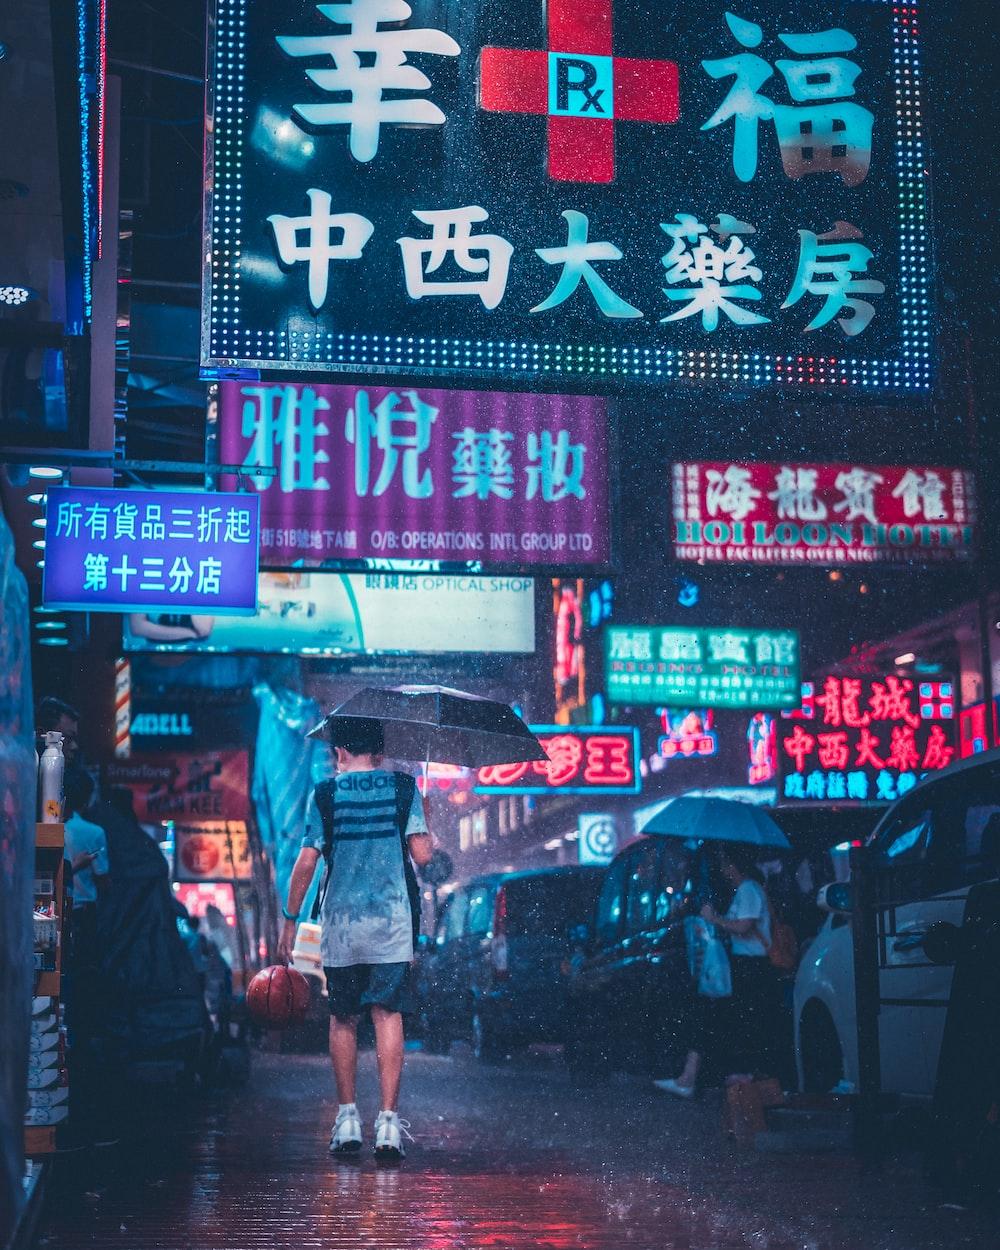 man in adidas shirt with umbrella walking in street under the rain